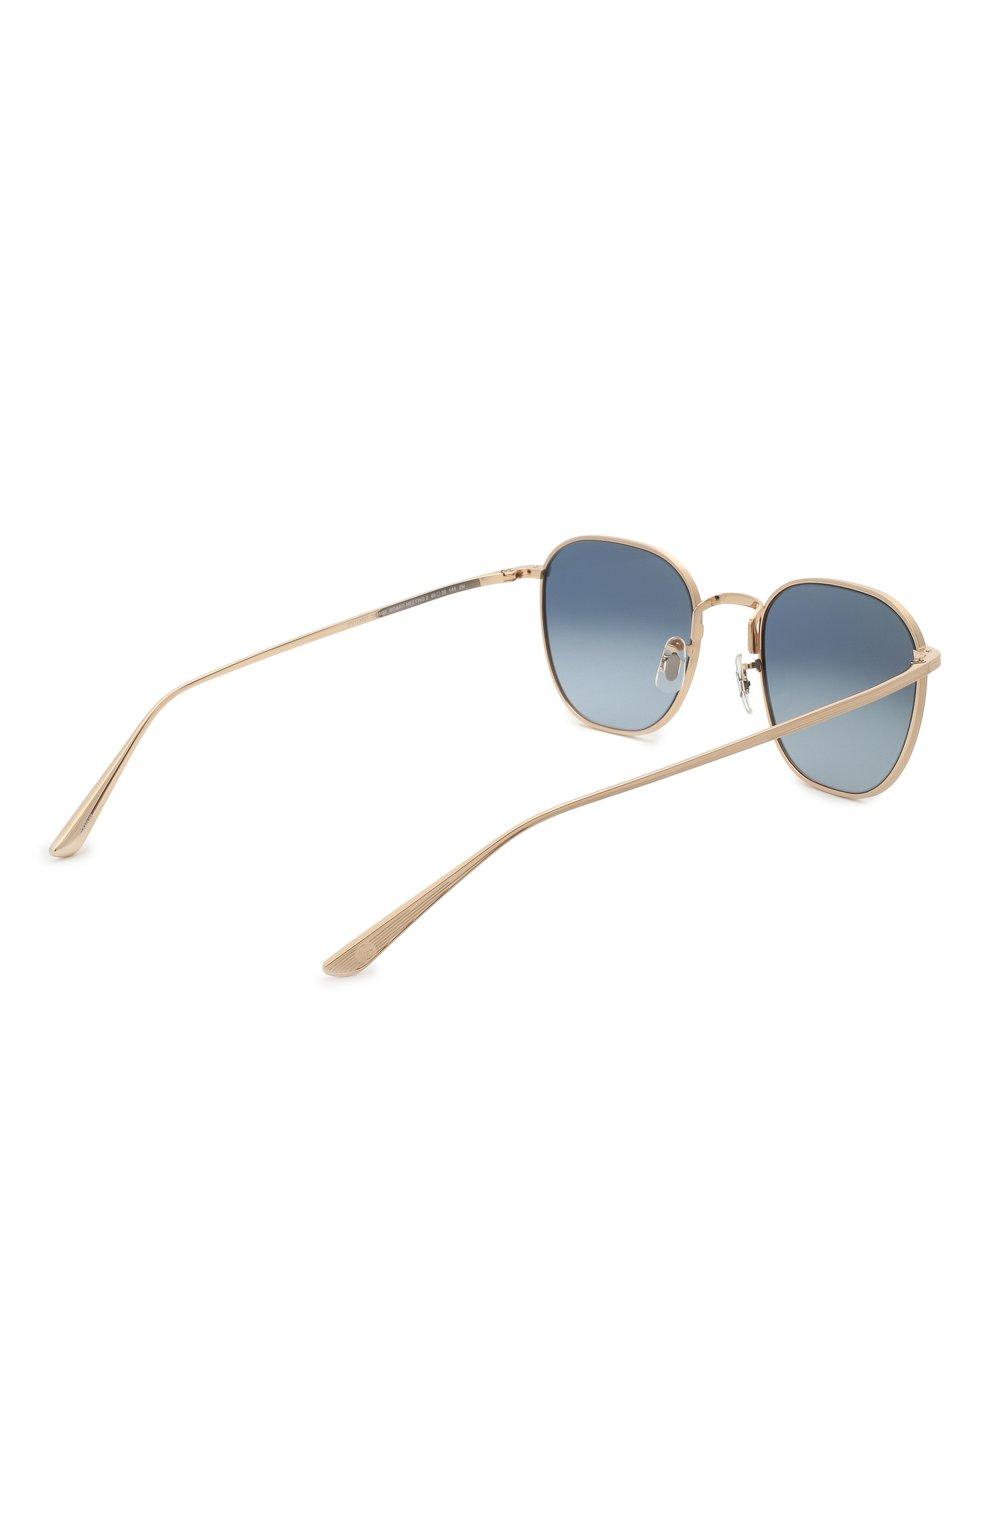 Женские солнцезащитные очки THE ROW X OLIVER PEOPLES синего цвета, арт. 1230ST-5035Q8 | Фото 5 (Тип очков: С/з; Очки форма: Круглые; Оптика Гендер: оптика-унисекс)